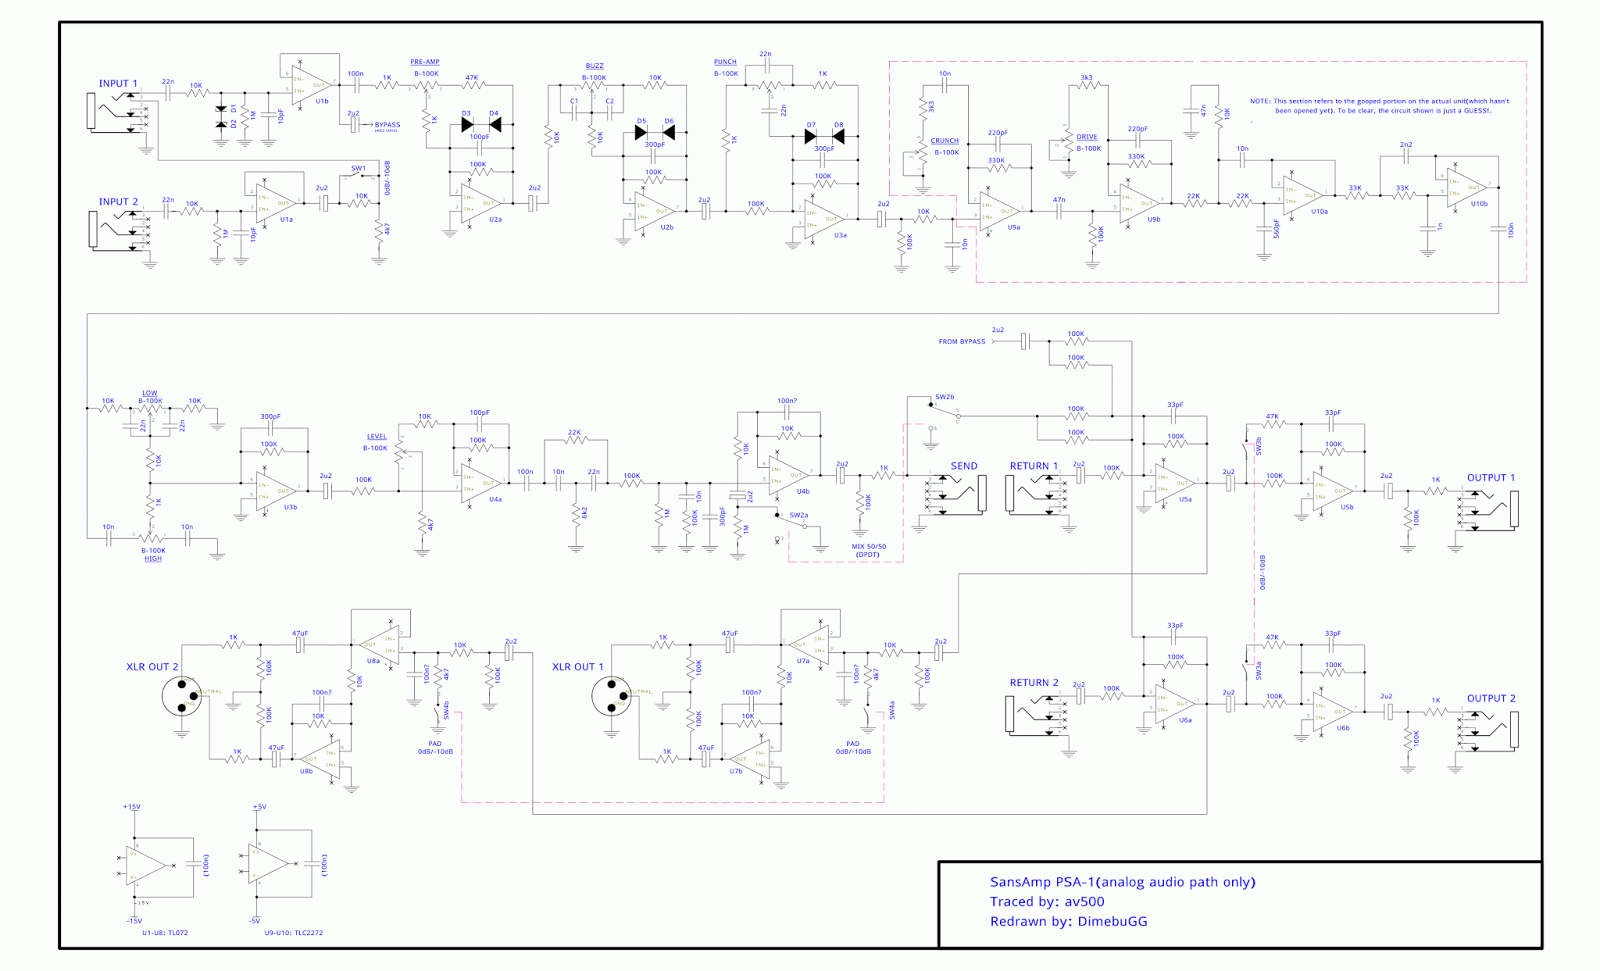 Usr Local Tech 21 Sansamp Psa 1 Pcb Traces And Schematics